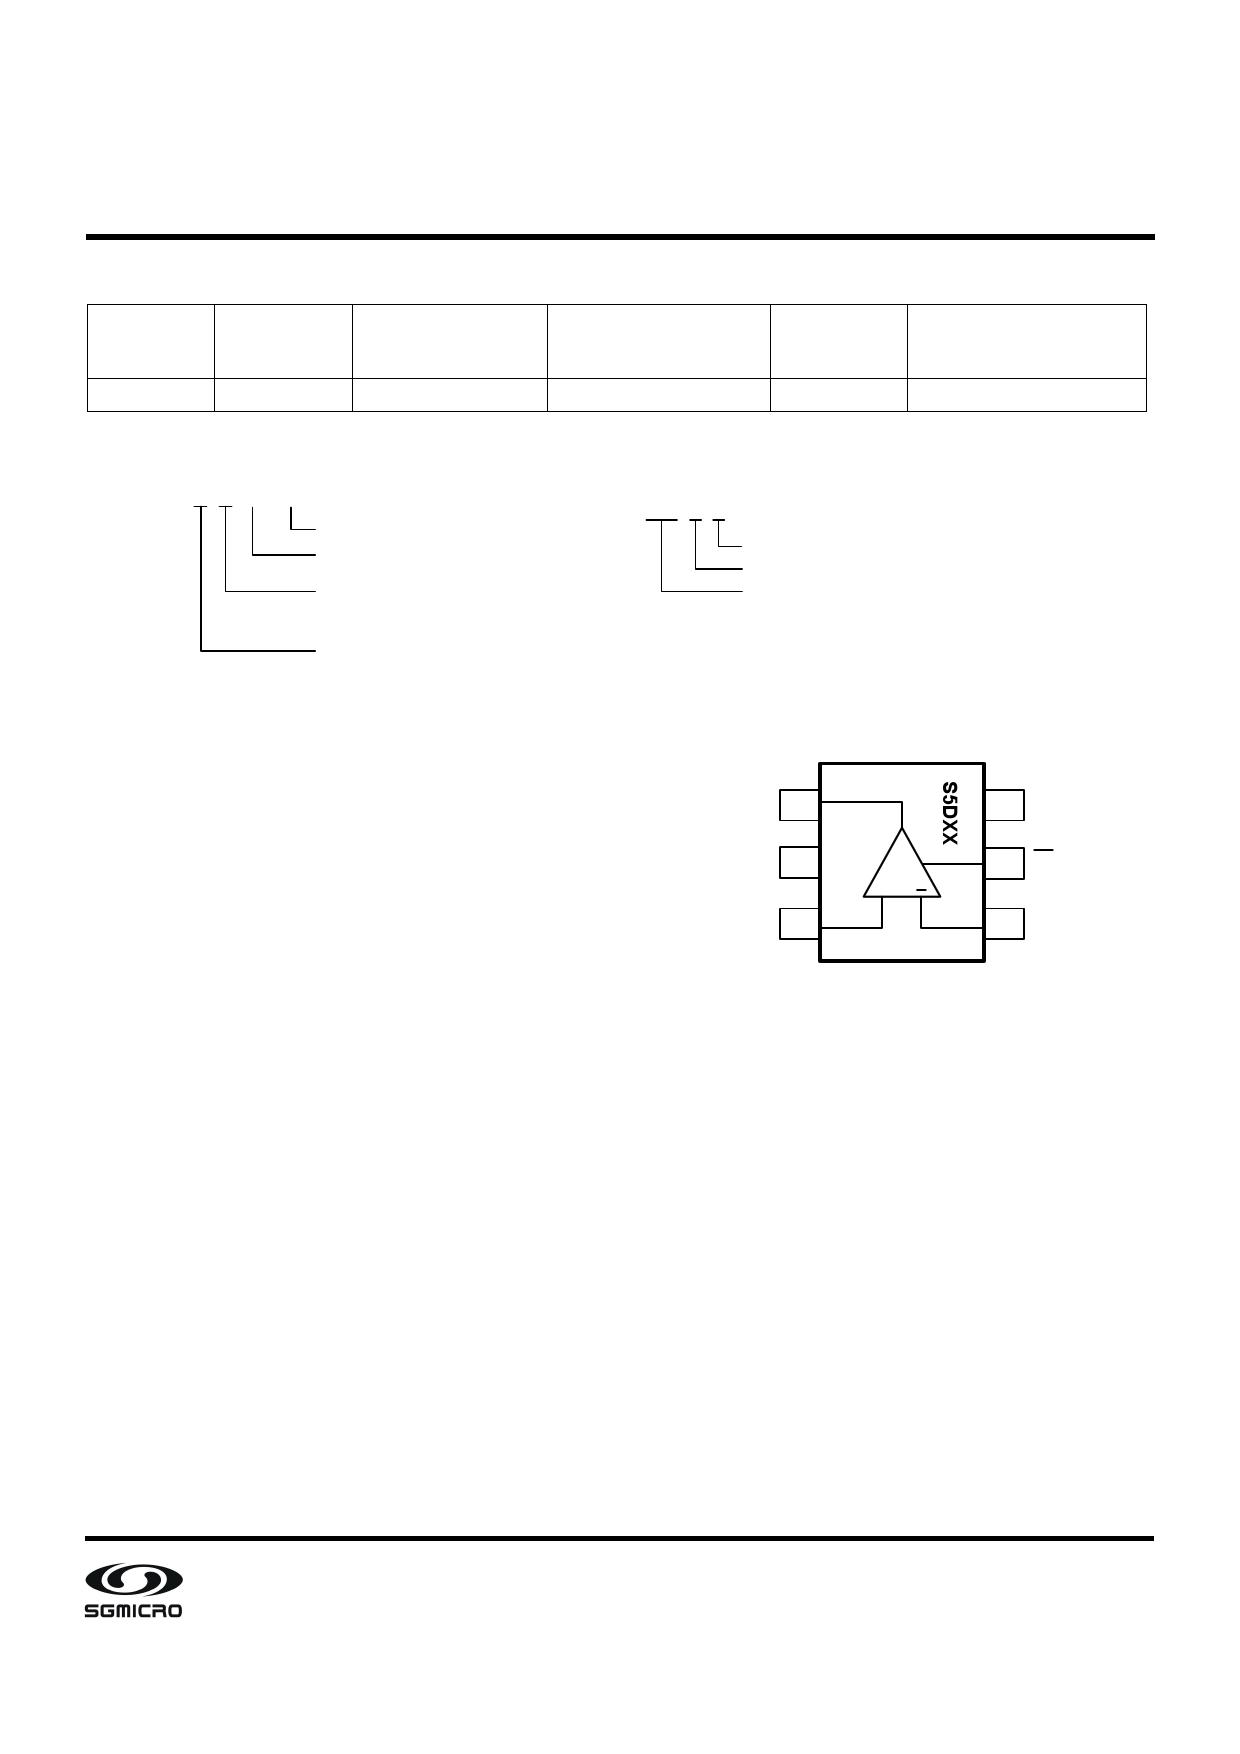 SGM8703 pdf, schematic